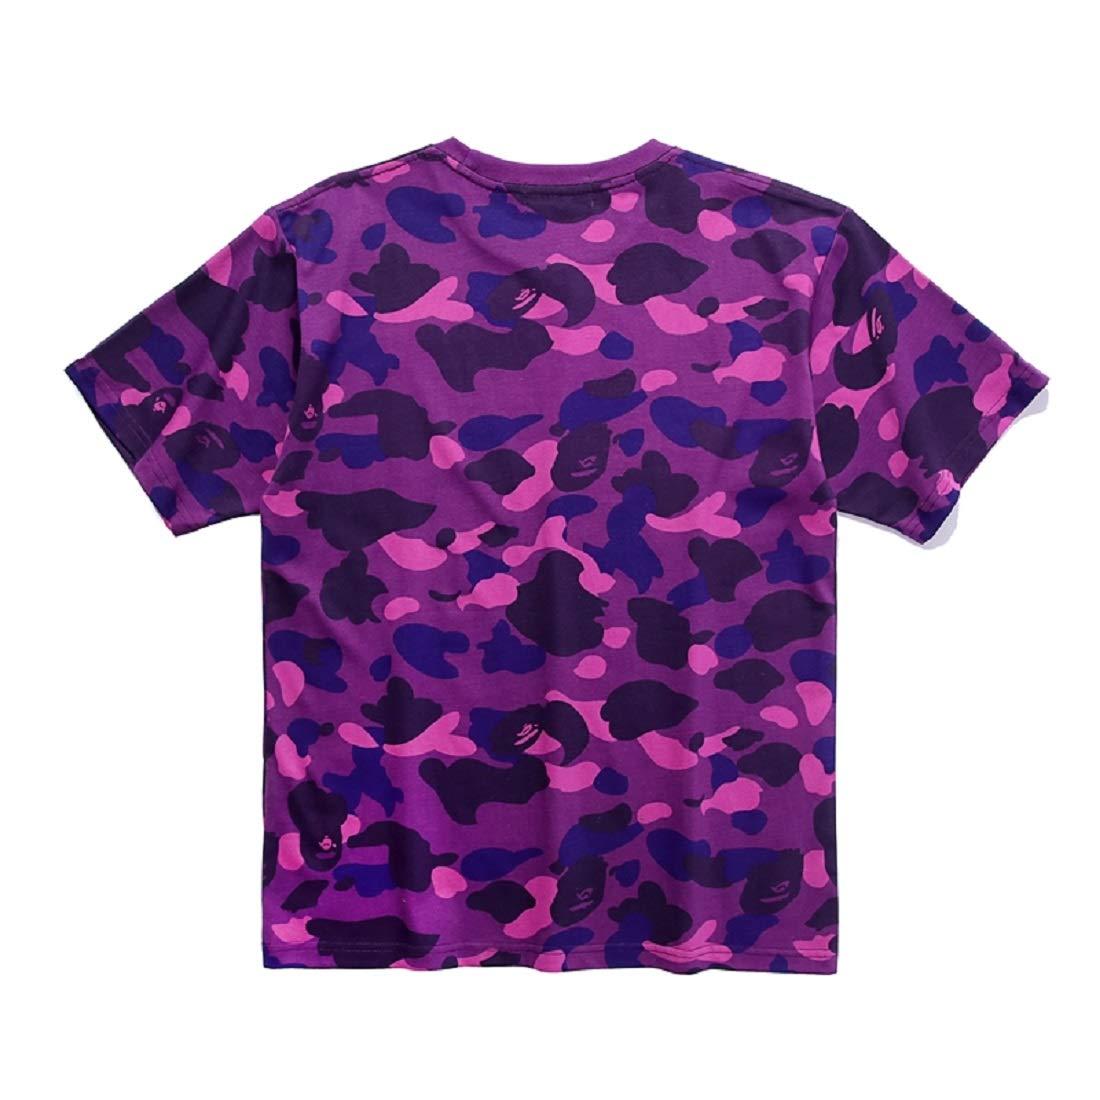 3f9691598a6a Amazon.com  Christo Boys Casual Fashion Crewneck T Shirt Camo Tees Unisex  Pullover Tops  Clothing